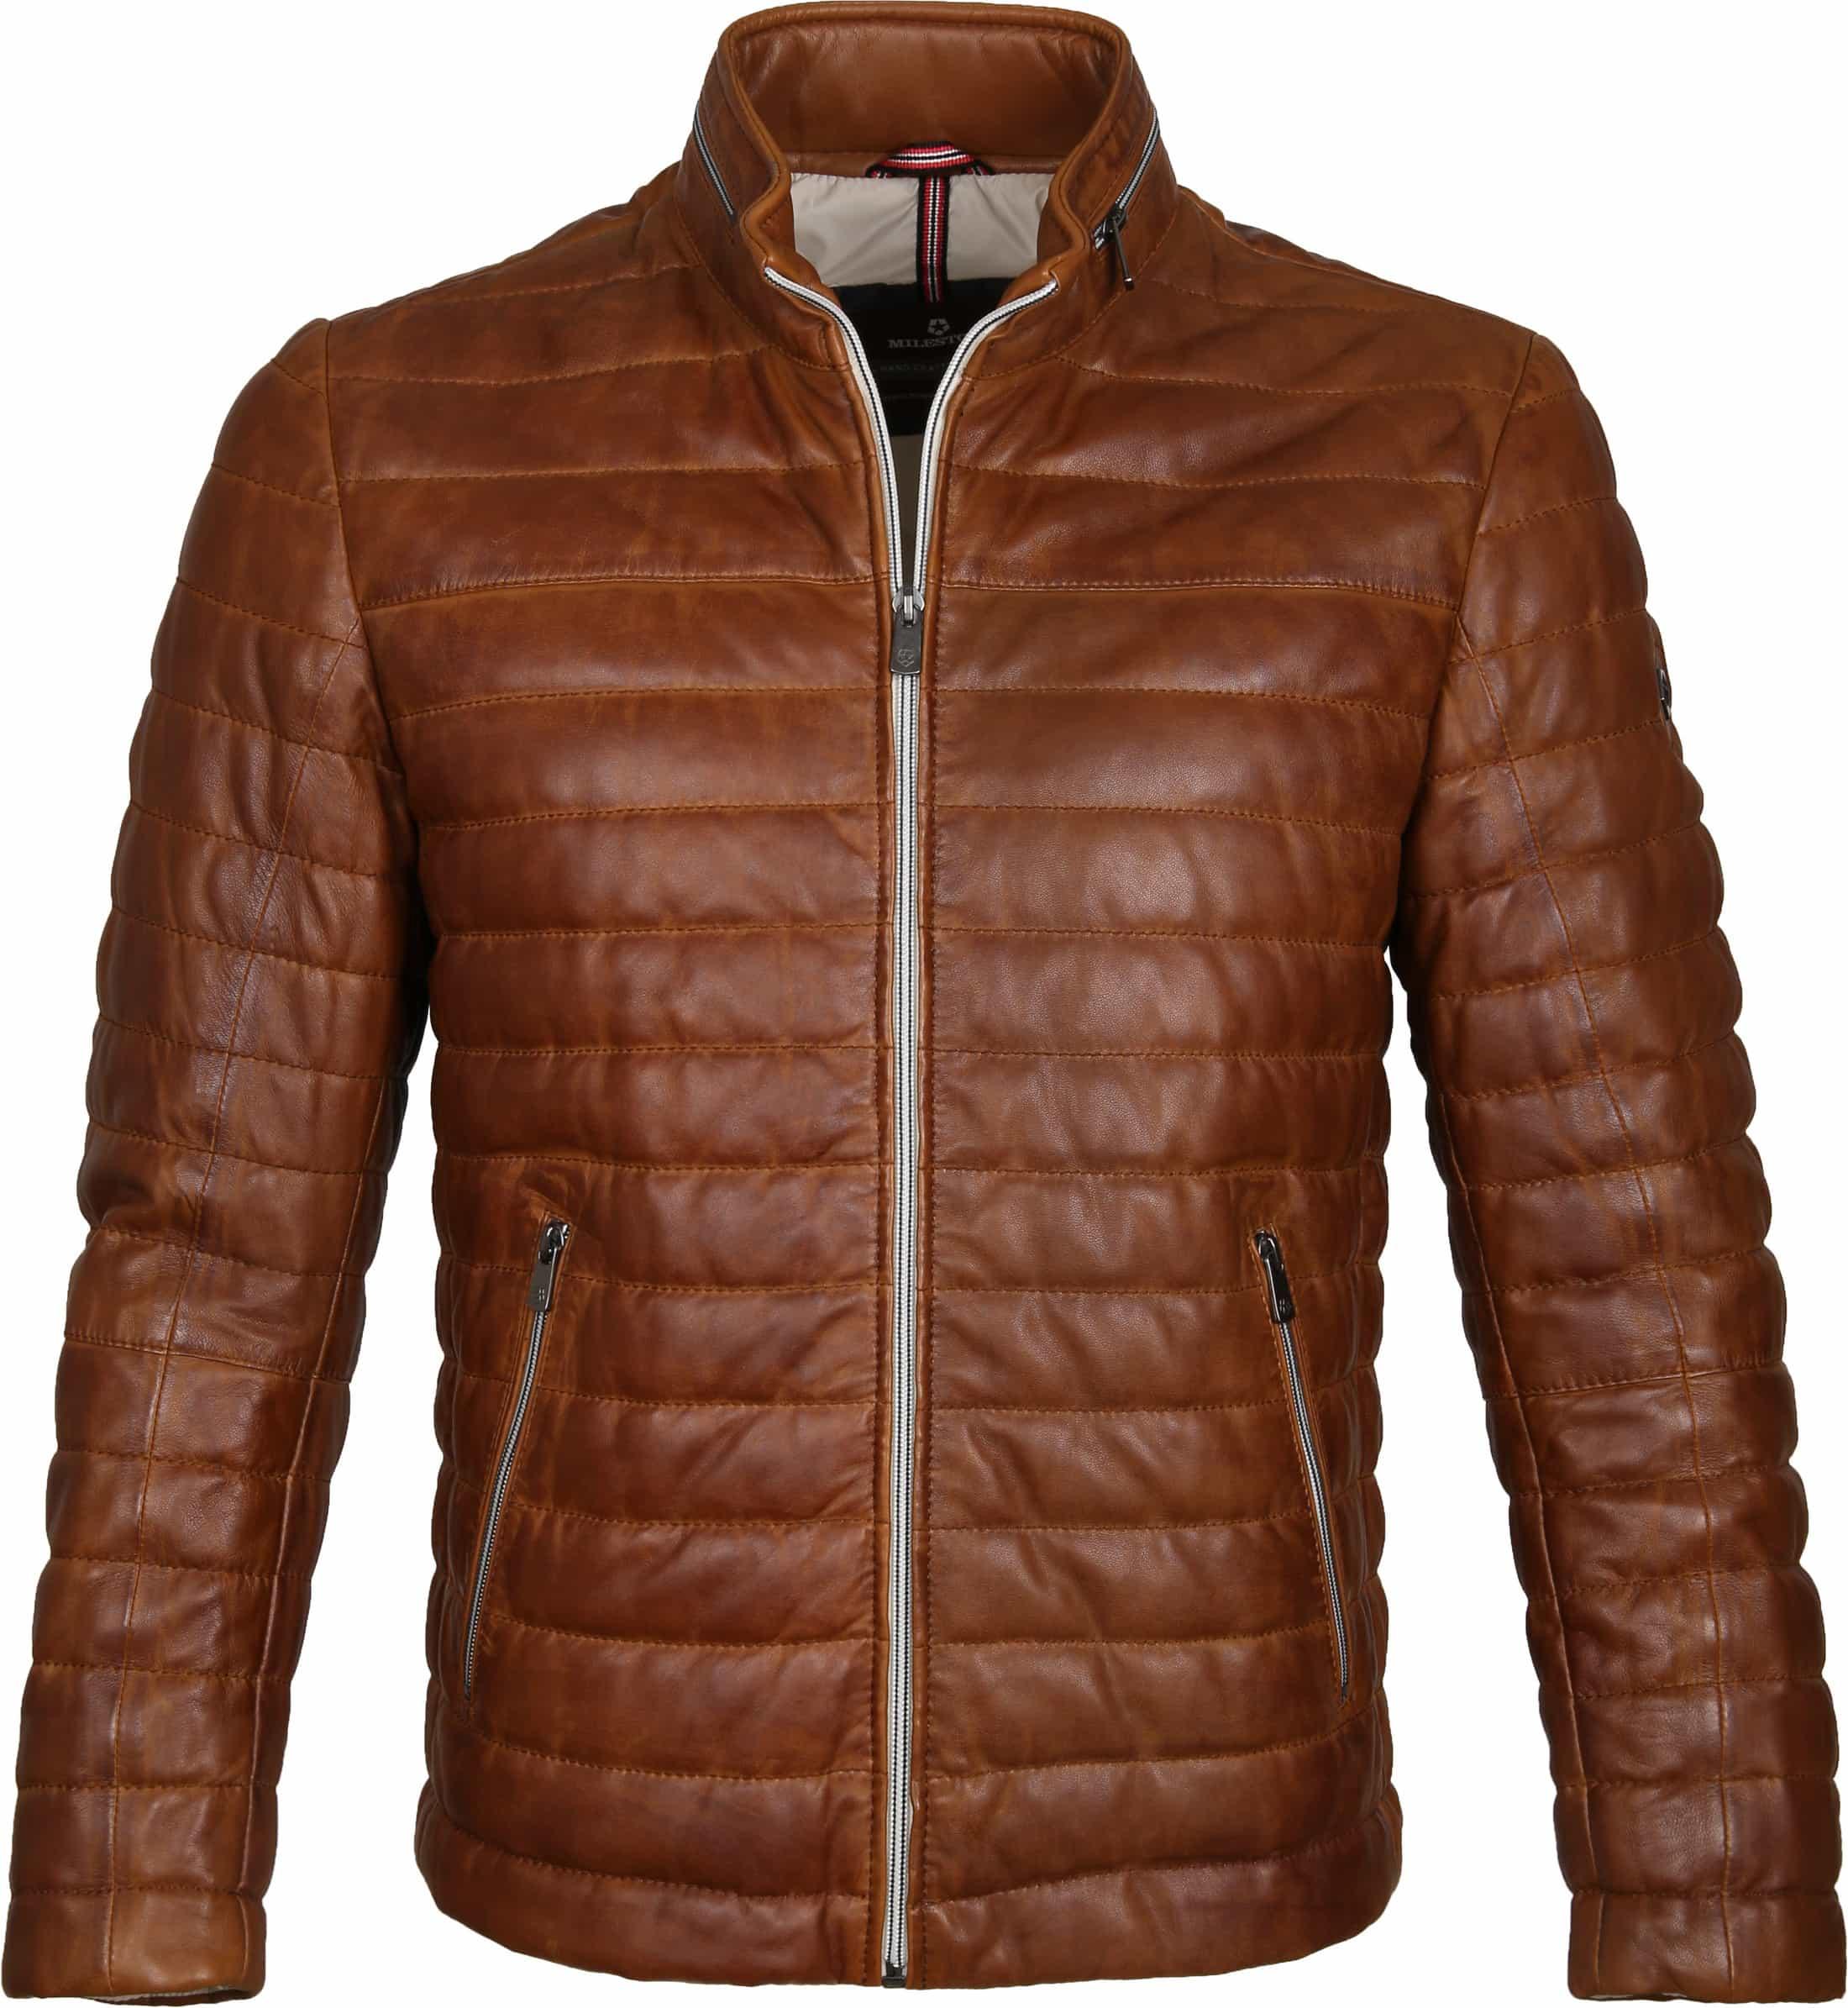 Milestone Tereno Leather Jacke Cognac foto 0